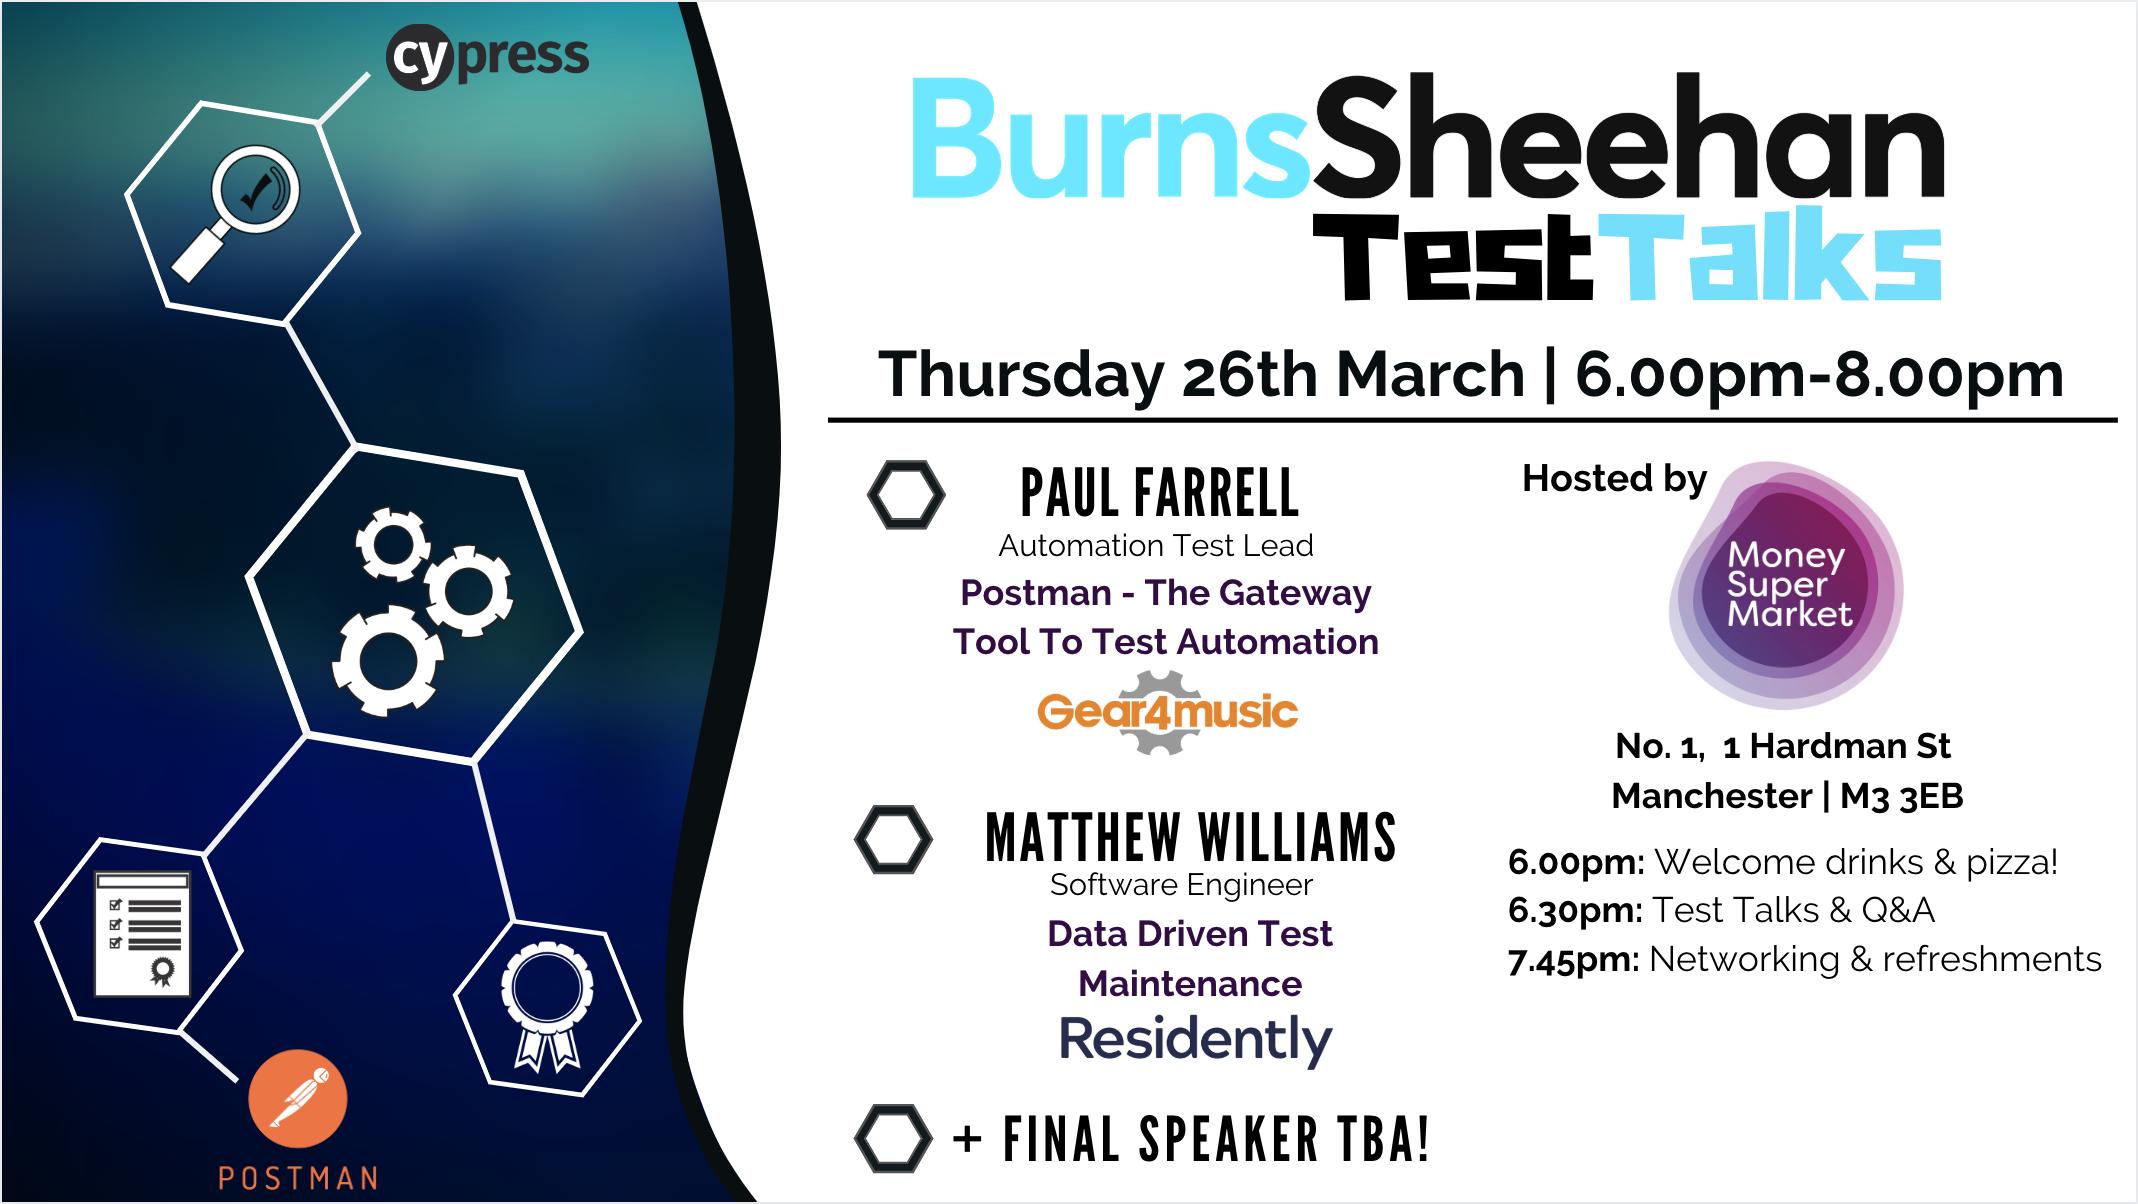 Burns Sheehan Test Talks Hosted By MoneySuperMarket